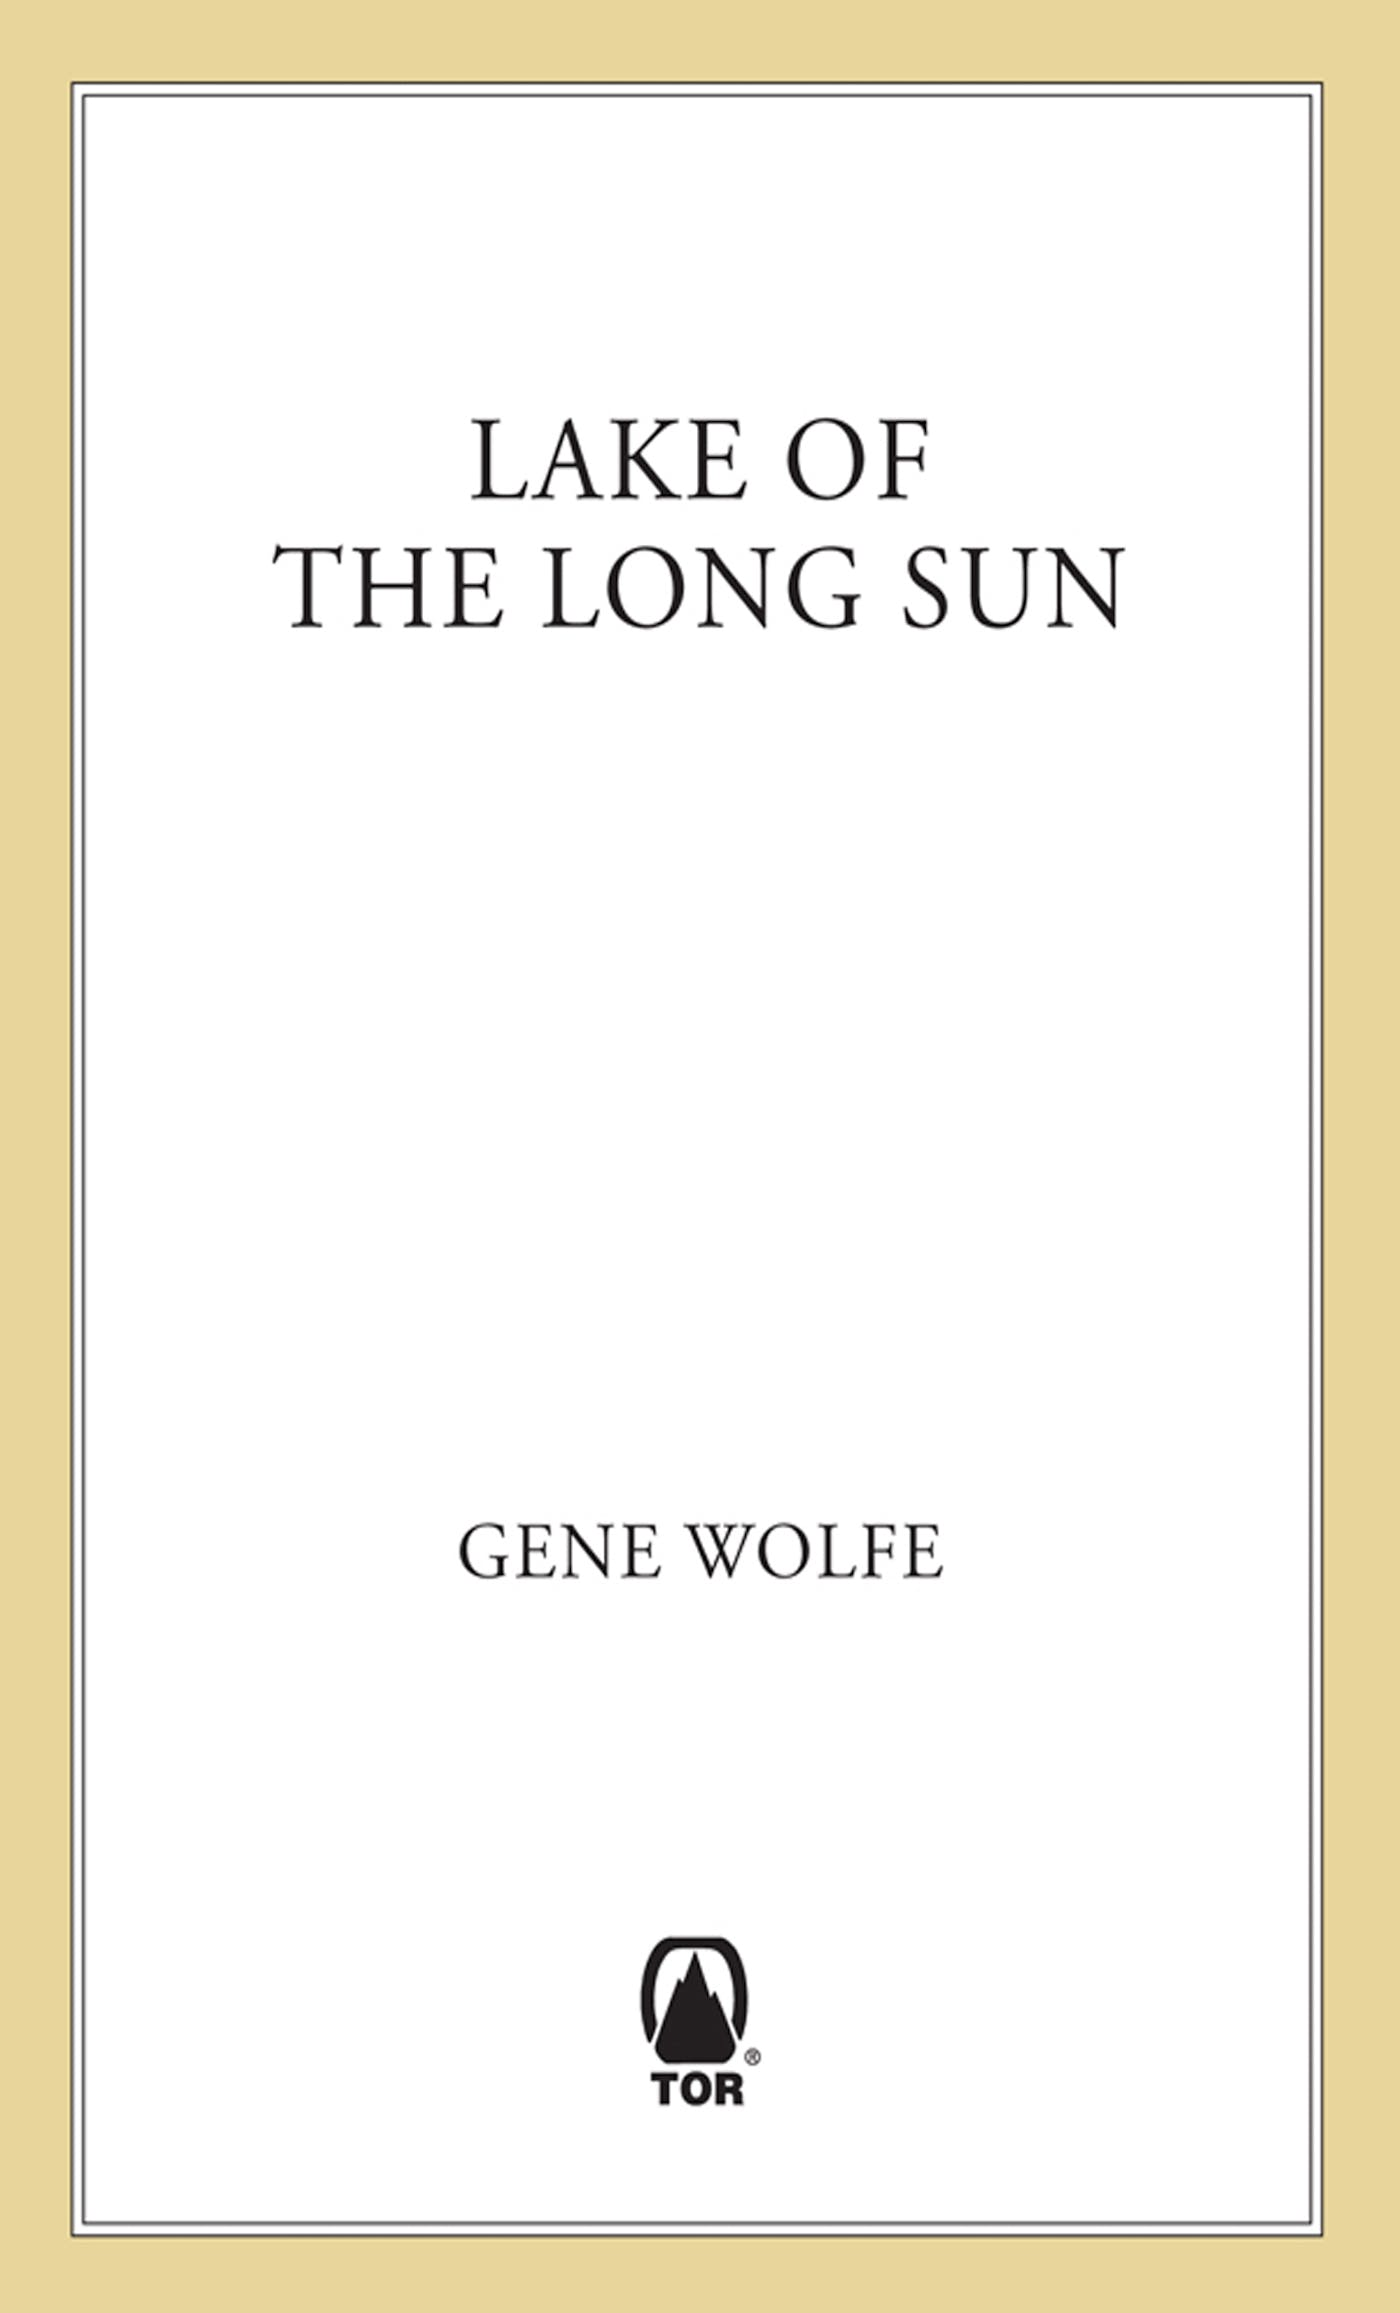 Image of Lake of the Long Sun